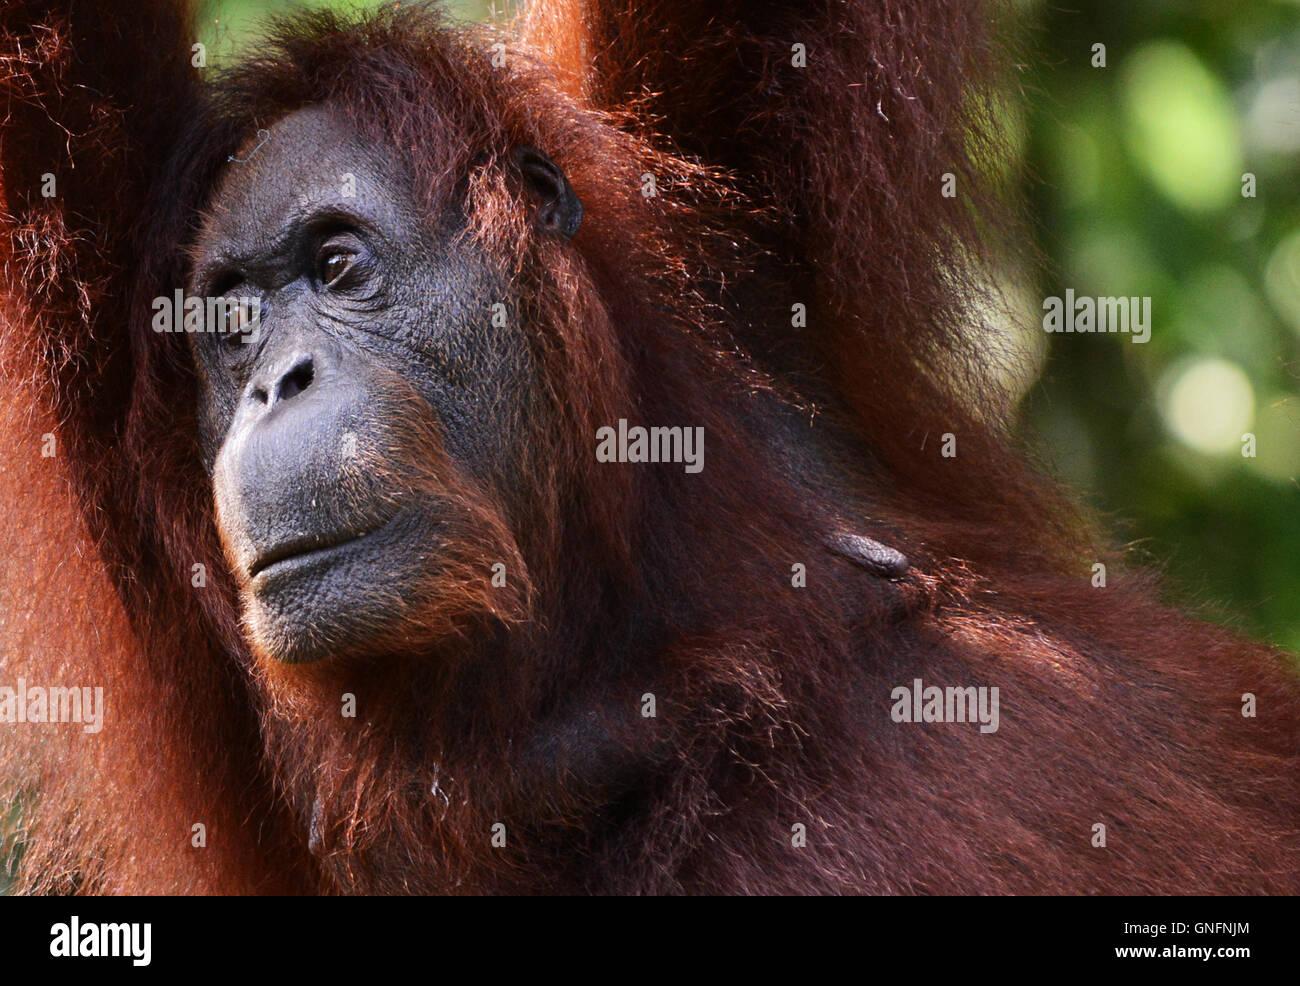 Portrait of a female Orangutan. - Stock Image